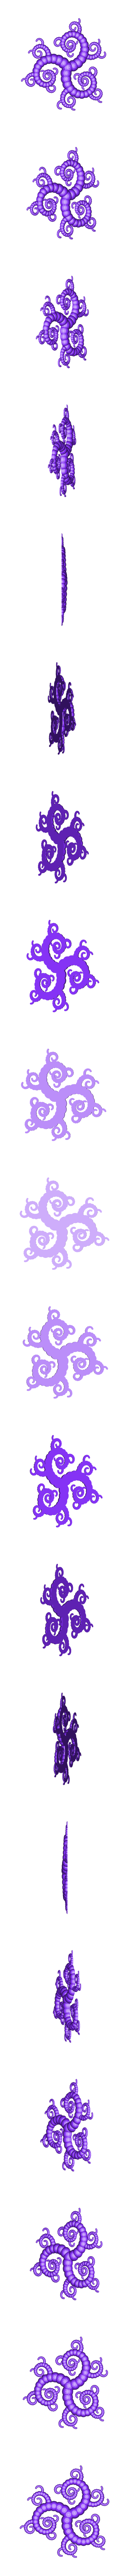 3_tentacles.stl Download free STL file Tentacle generator • 3D print object, ferjerez3d